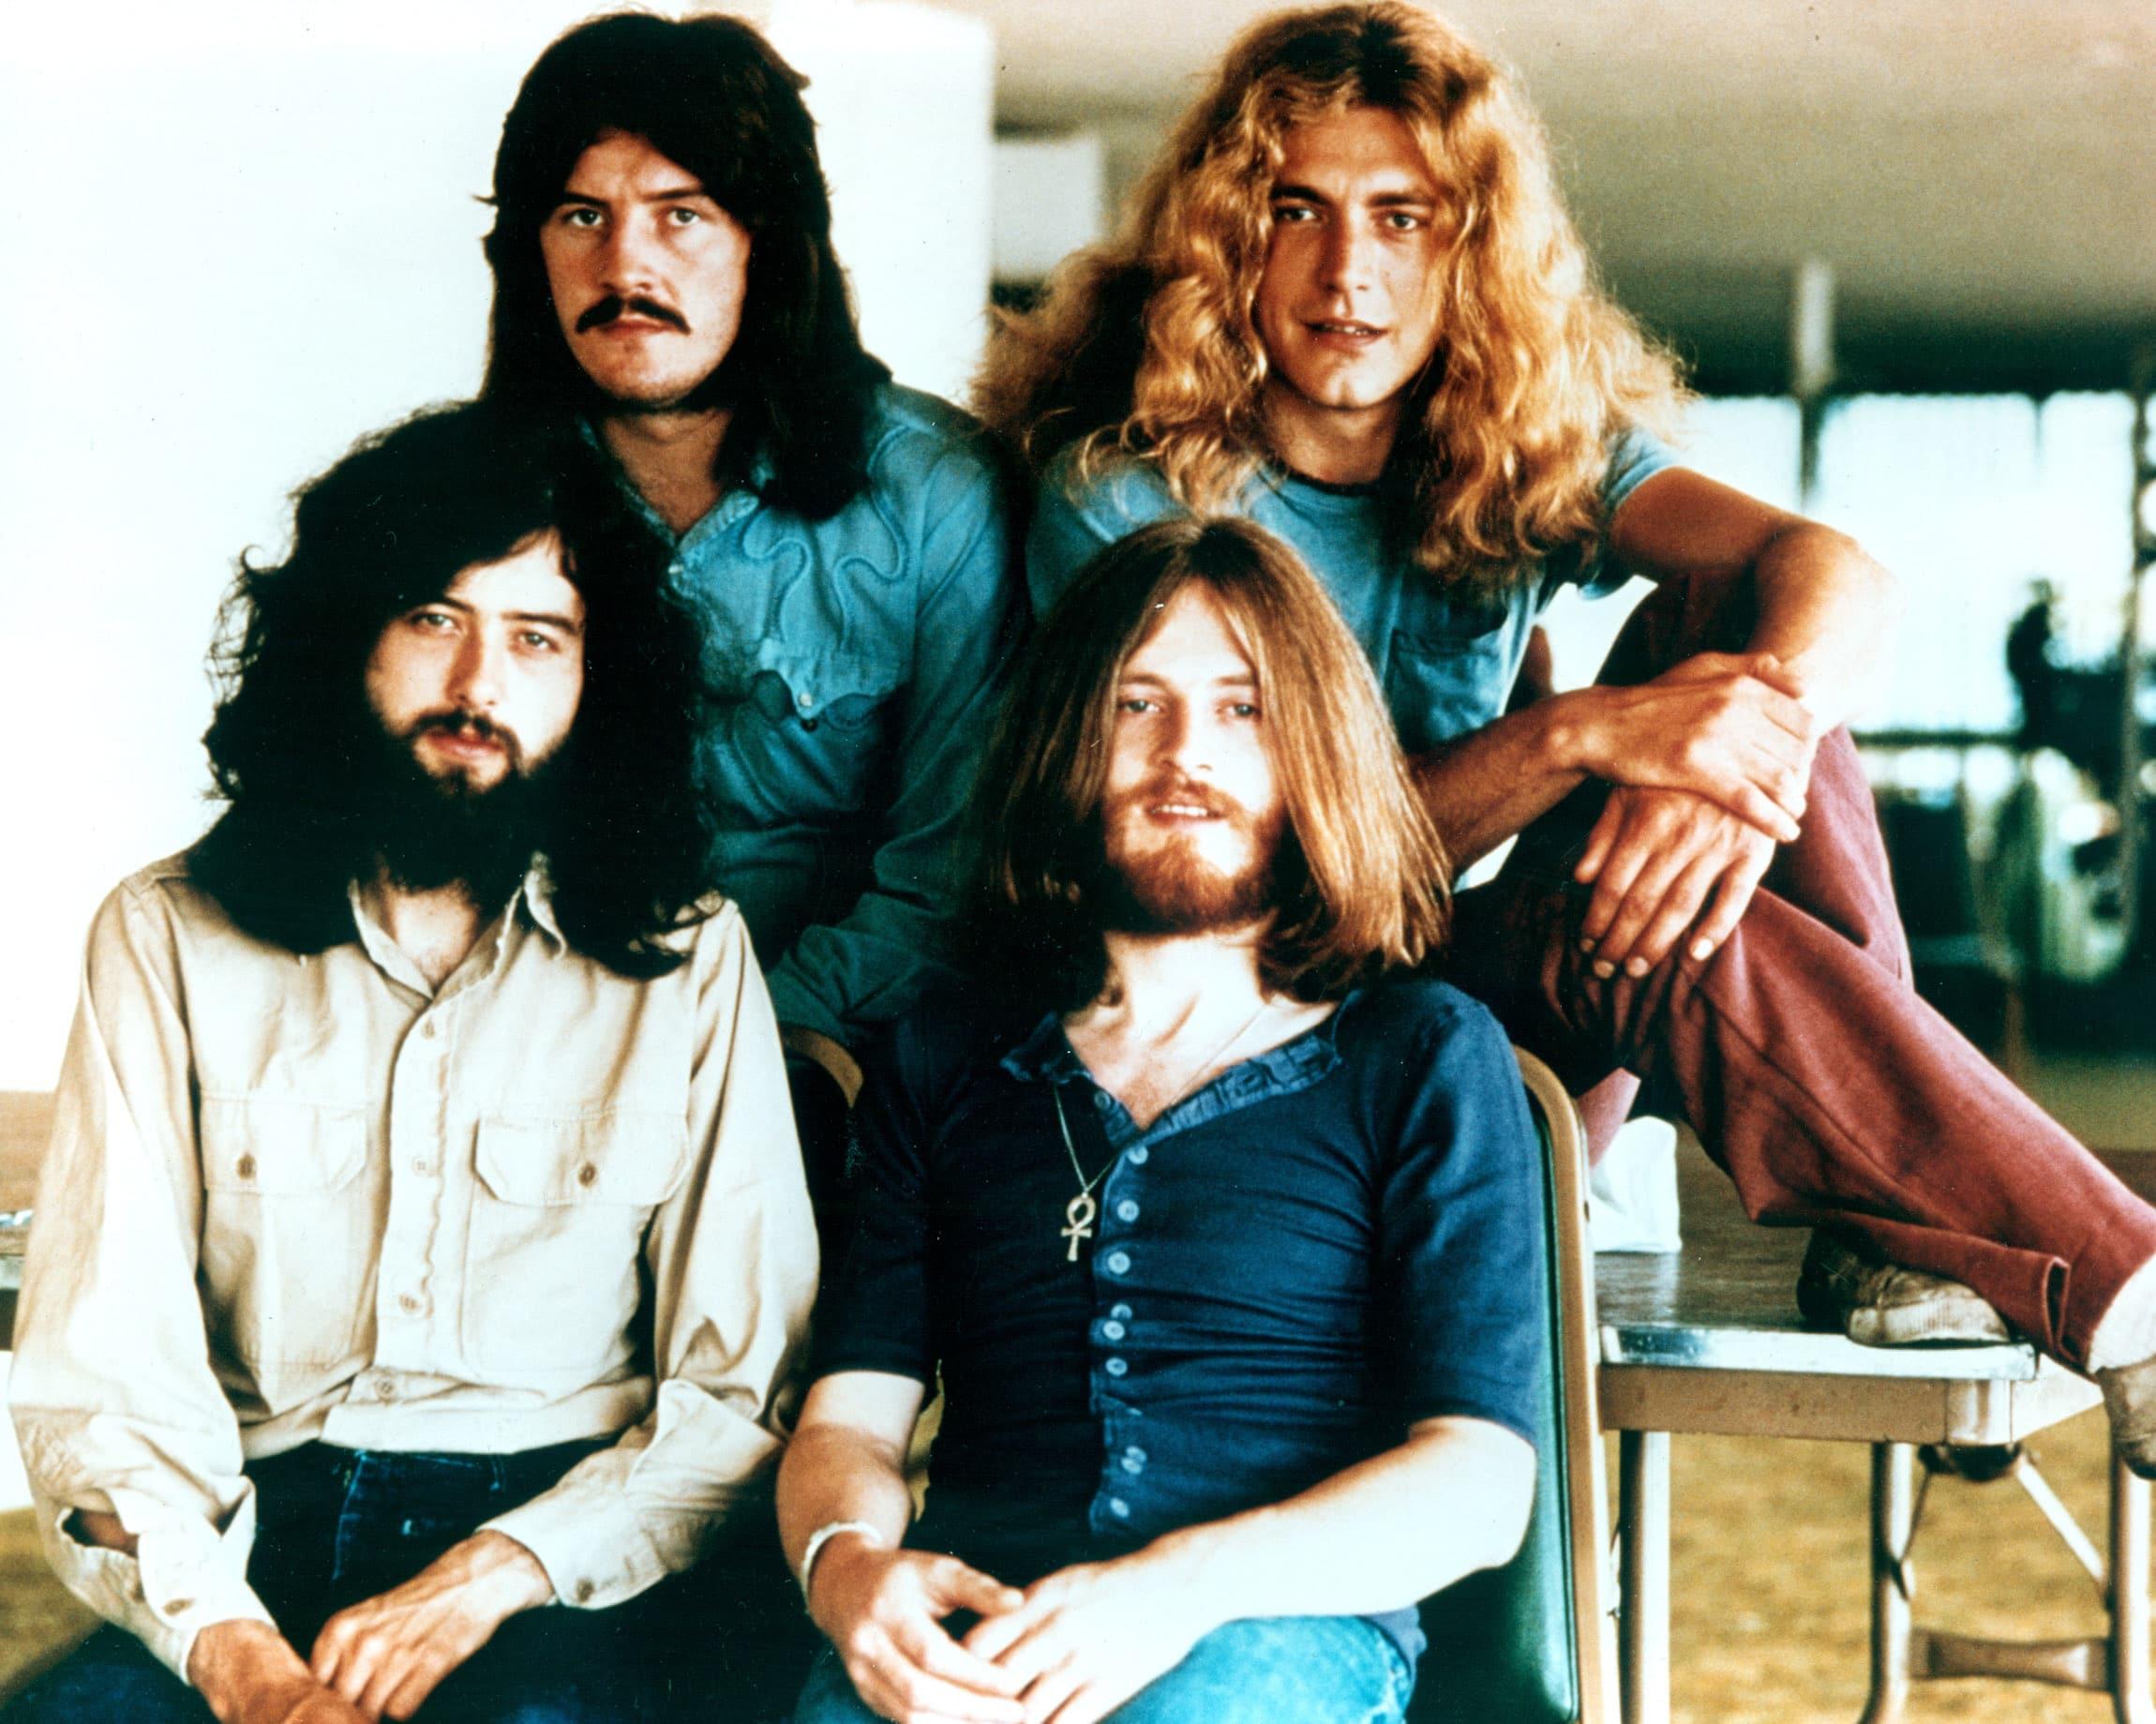 Led Zeppelin, promotional portrait for their 1973 US Tour